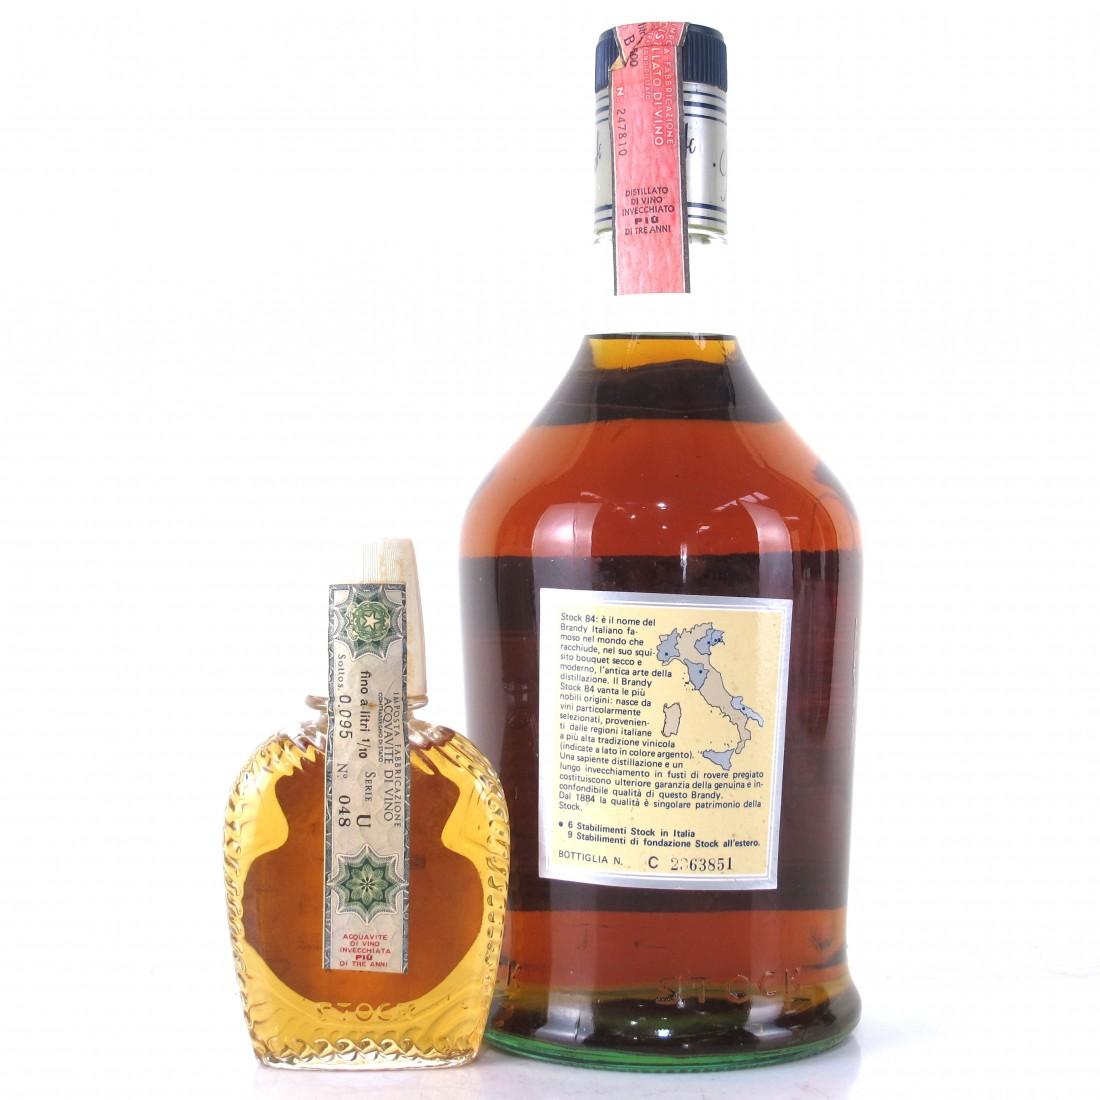 Stock 84 VVS OP Brandy 1970s 1.5 Litre / Including 10cl Miniature